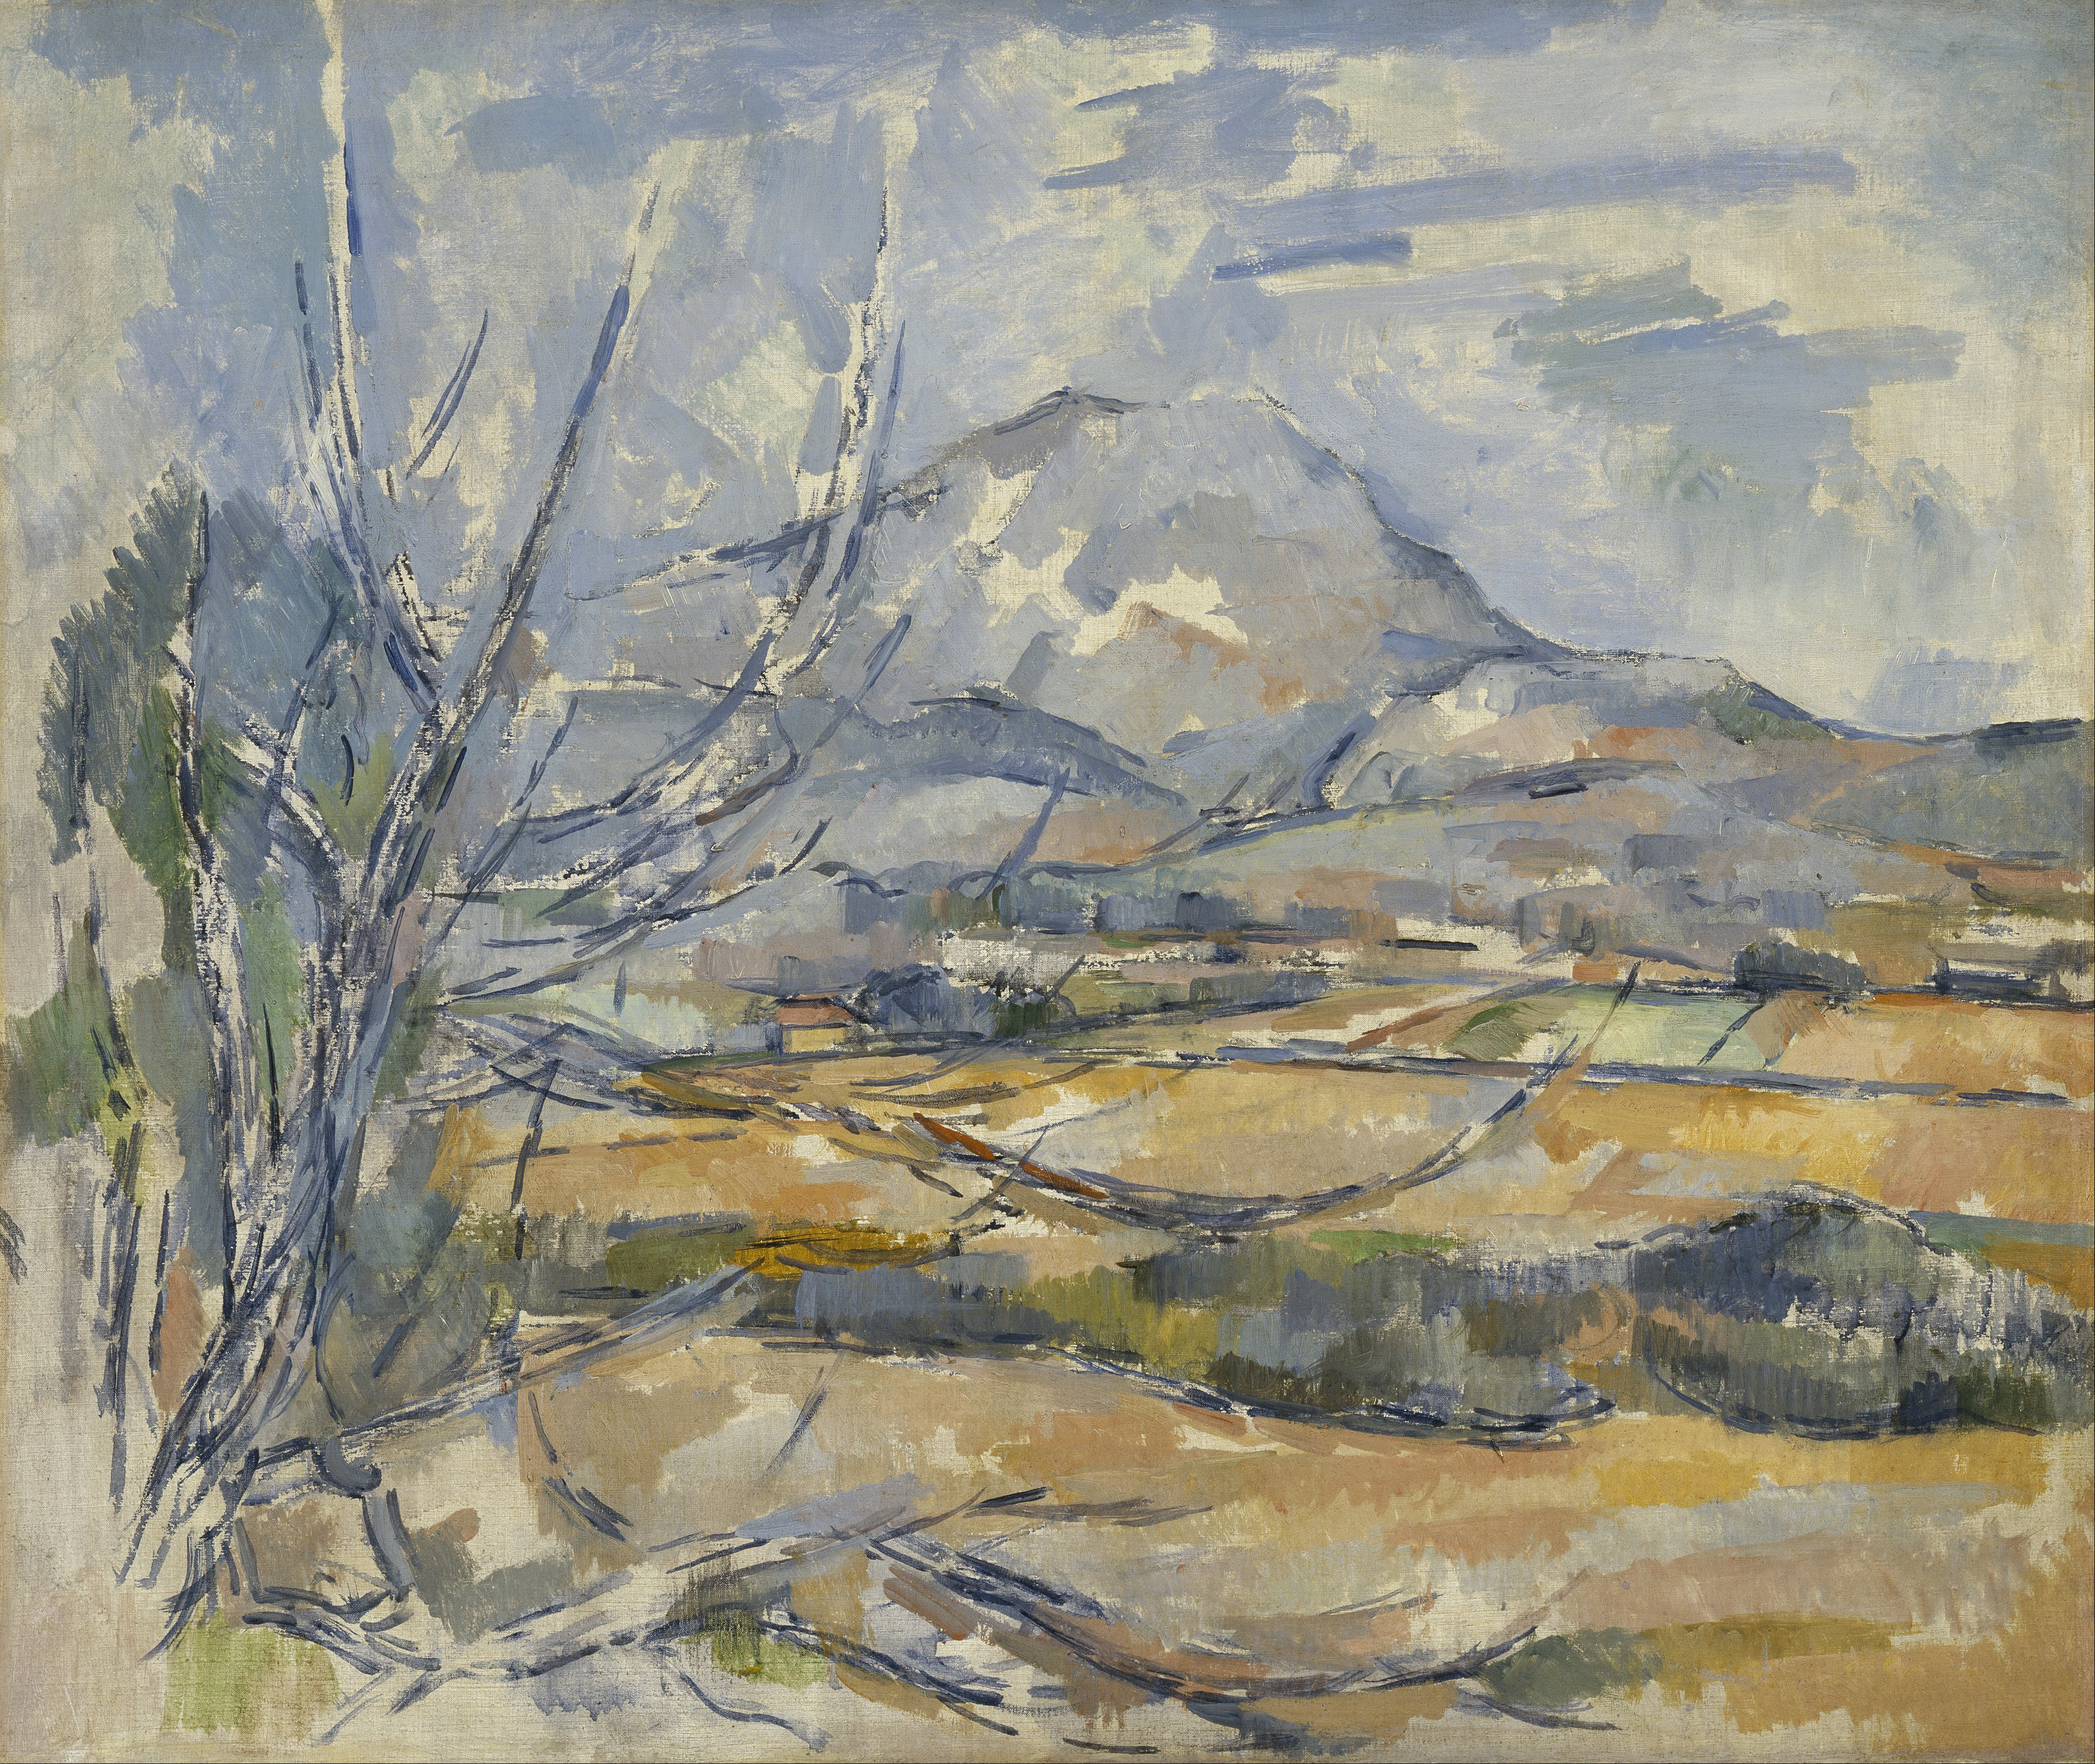 Файл:Paul Cezanne - Montagne Sainte-Victoire - Google Art Project.jpg